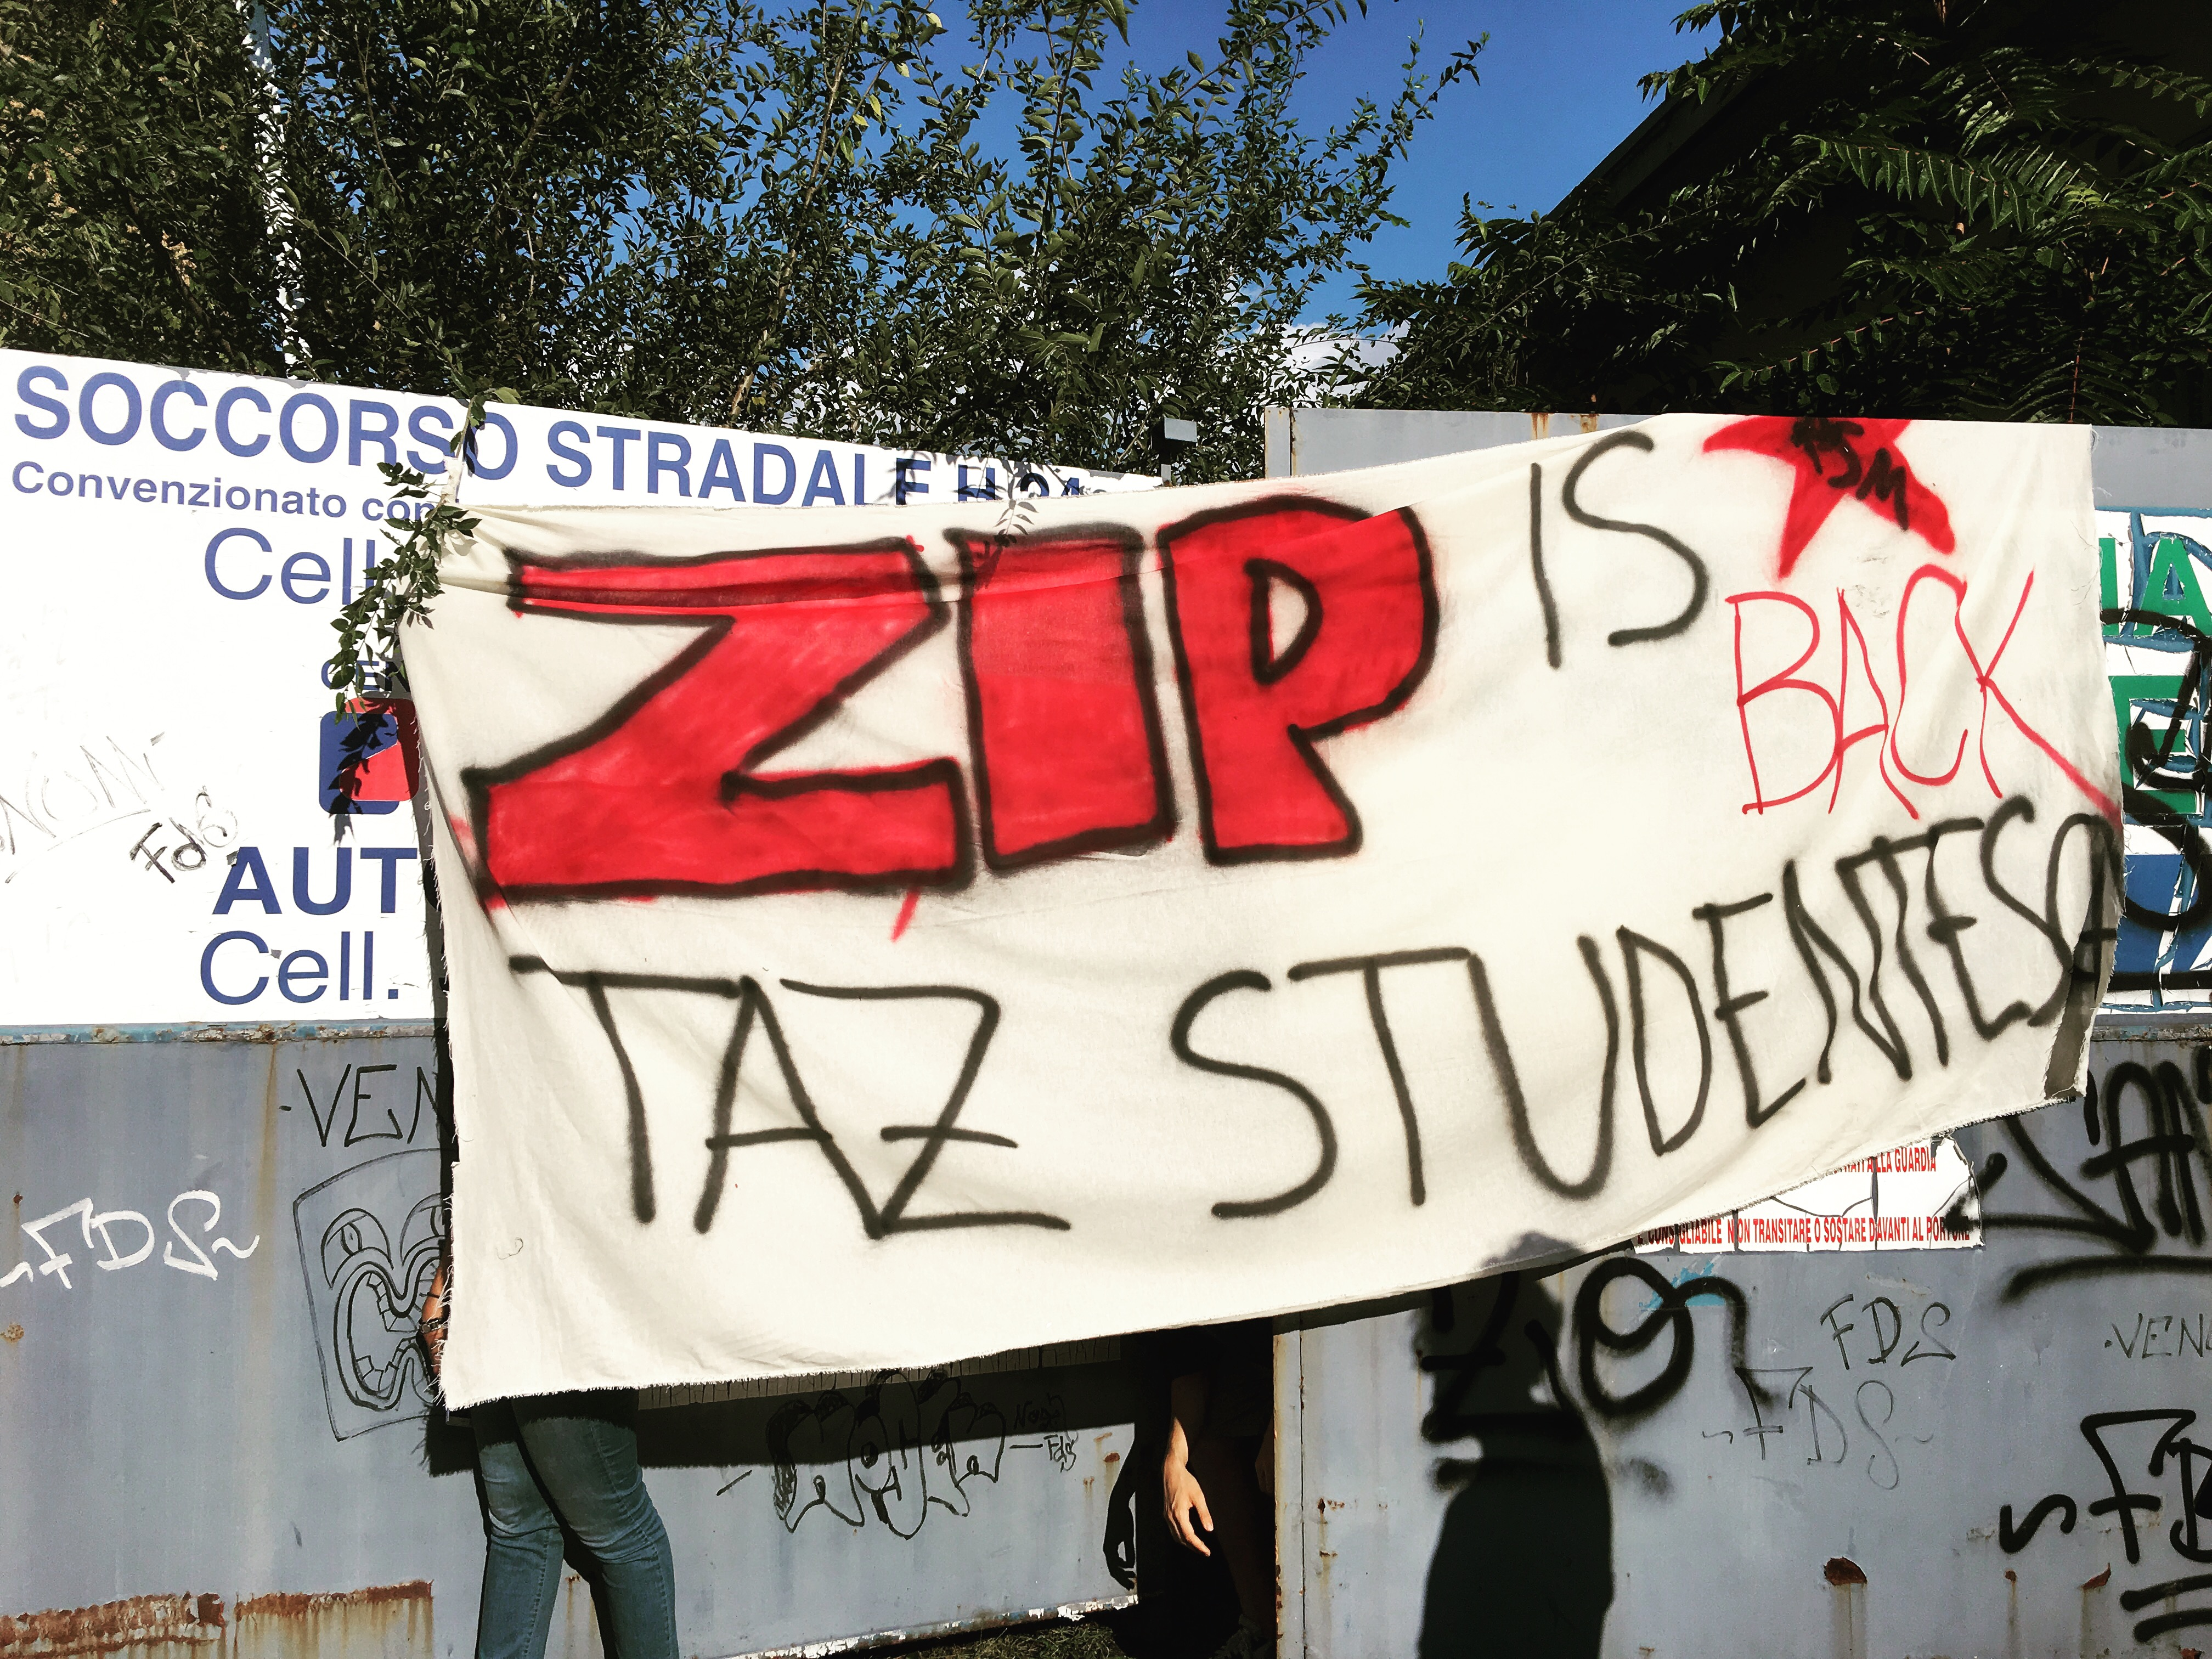 ZIP is back. TAZ studentesca